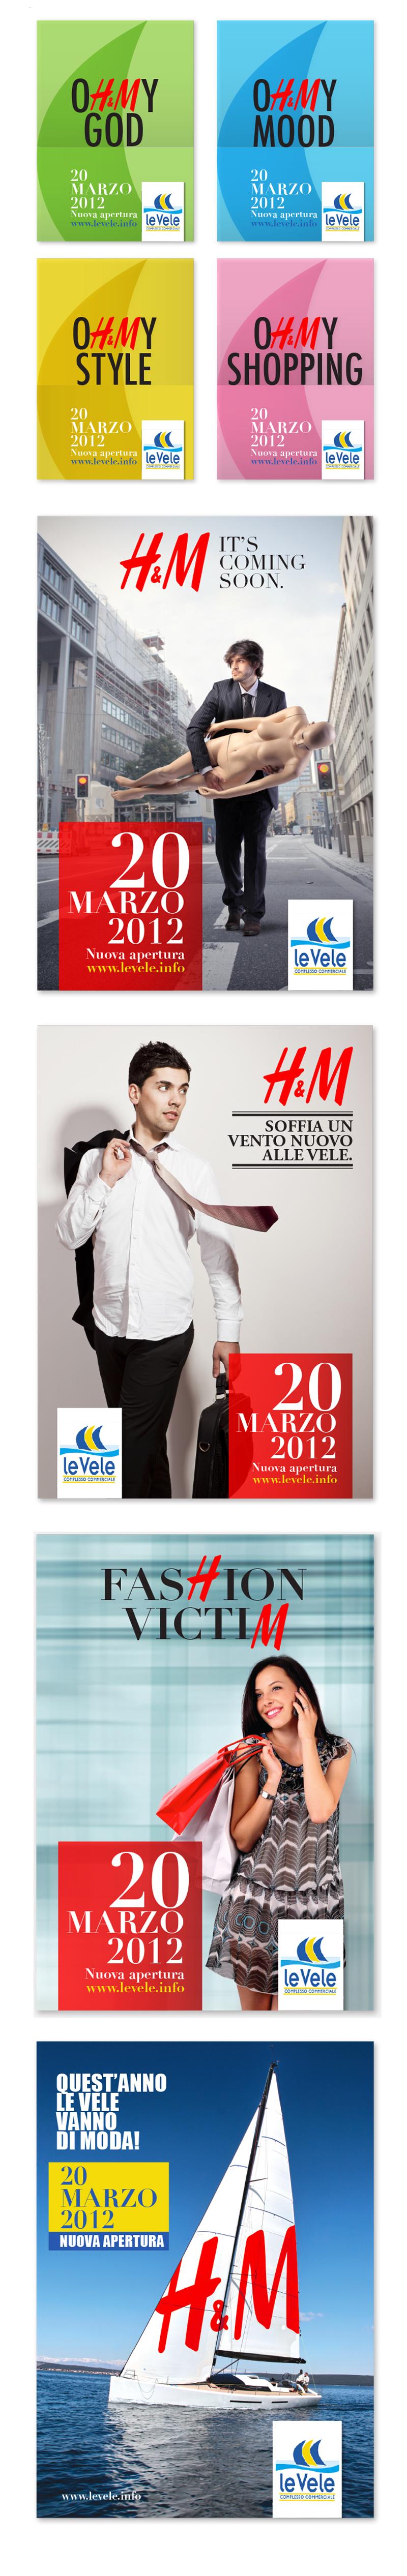 H&M - Apertura alle Vele Desenzano